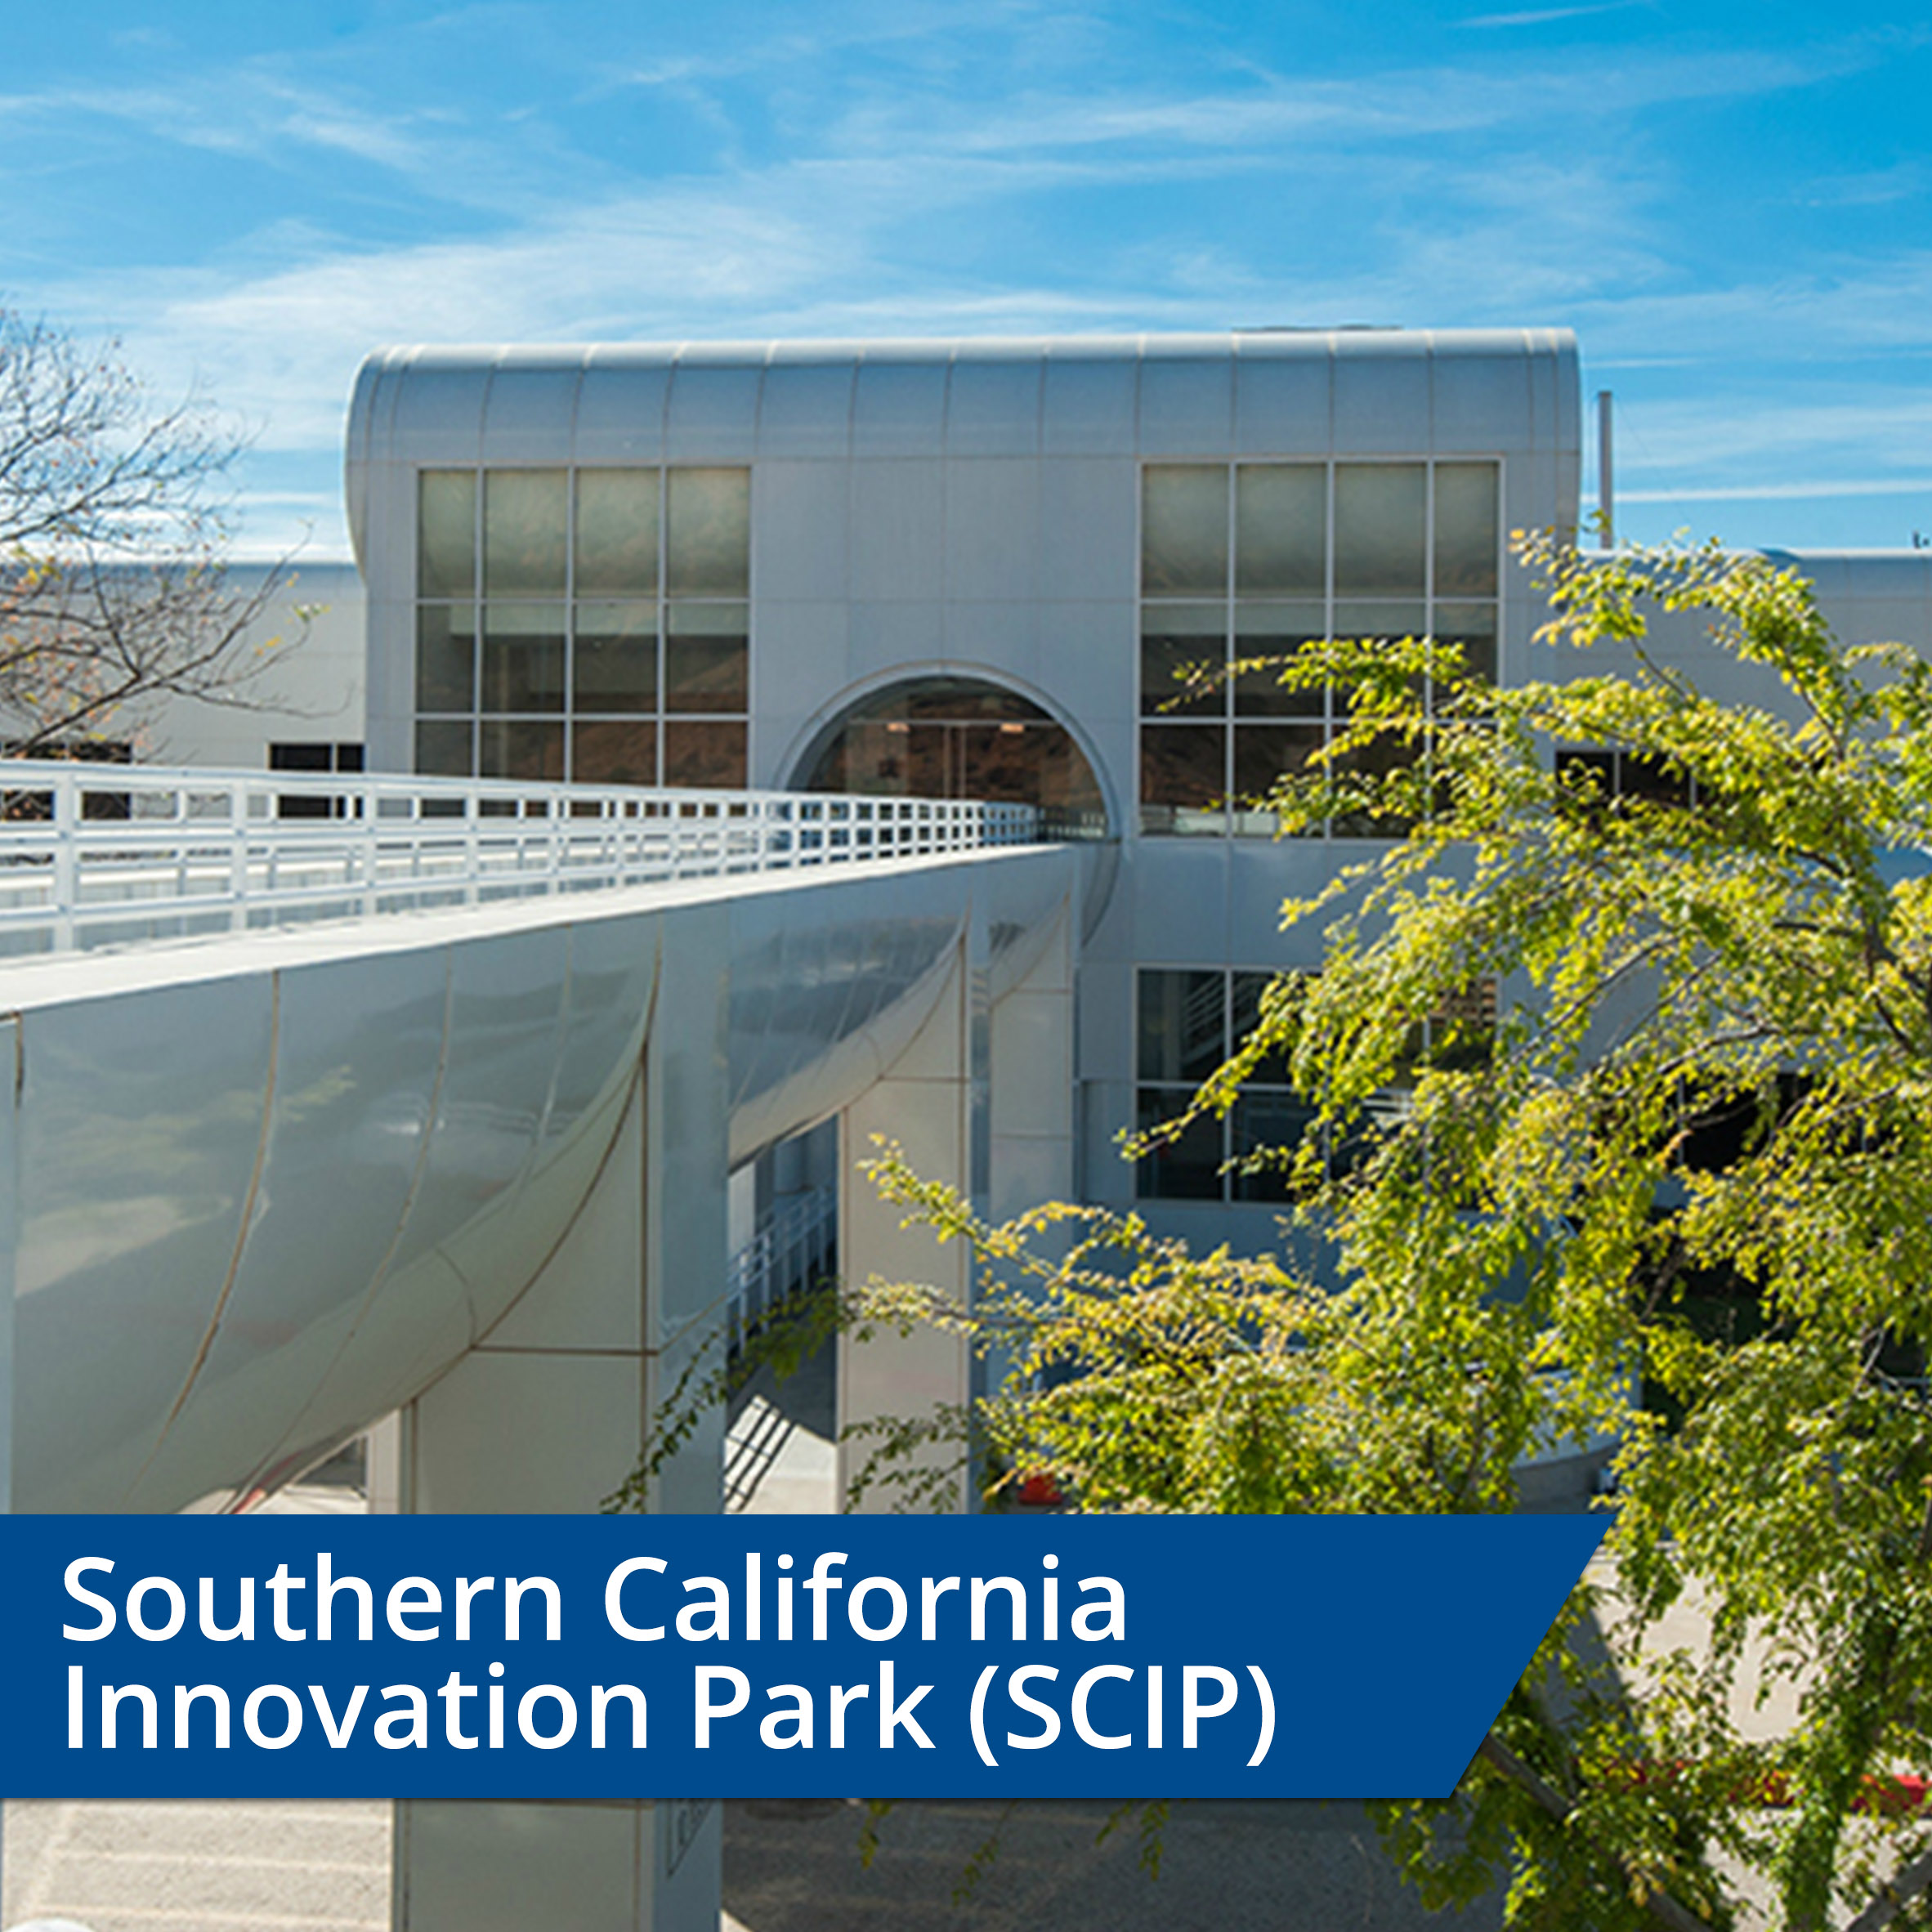 Southern California Innovation Park (SCIP)